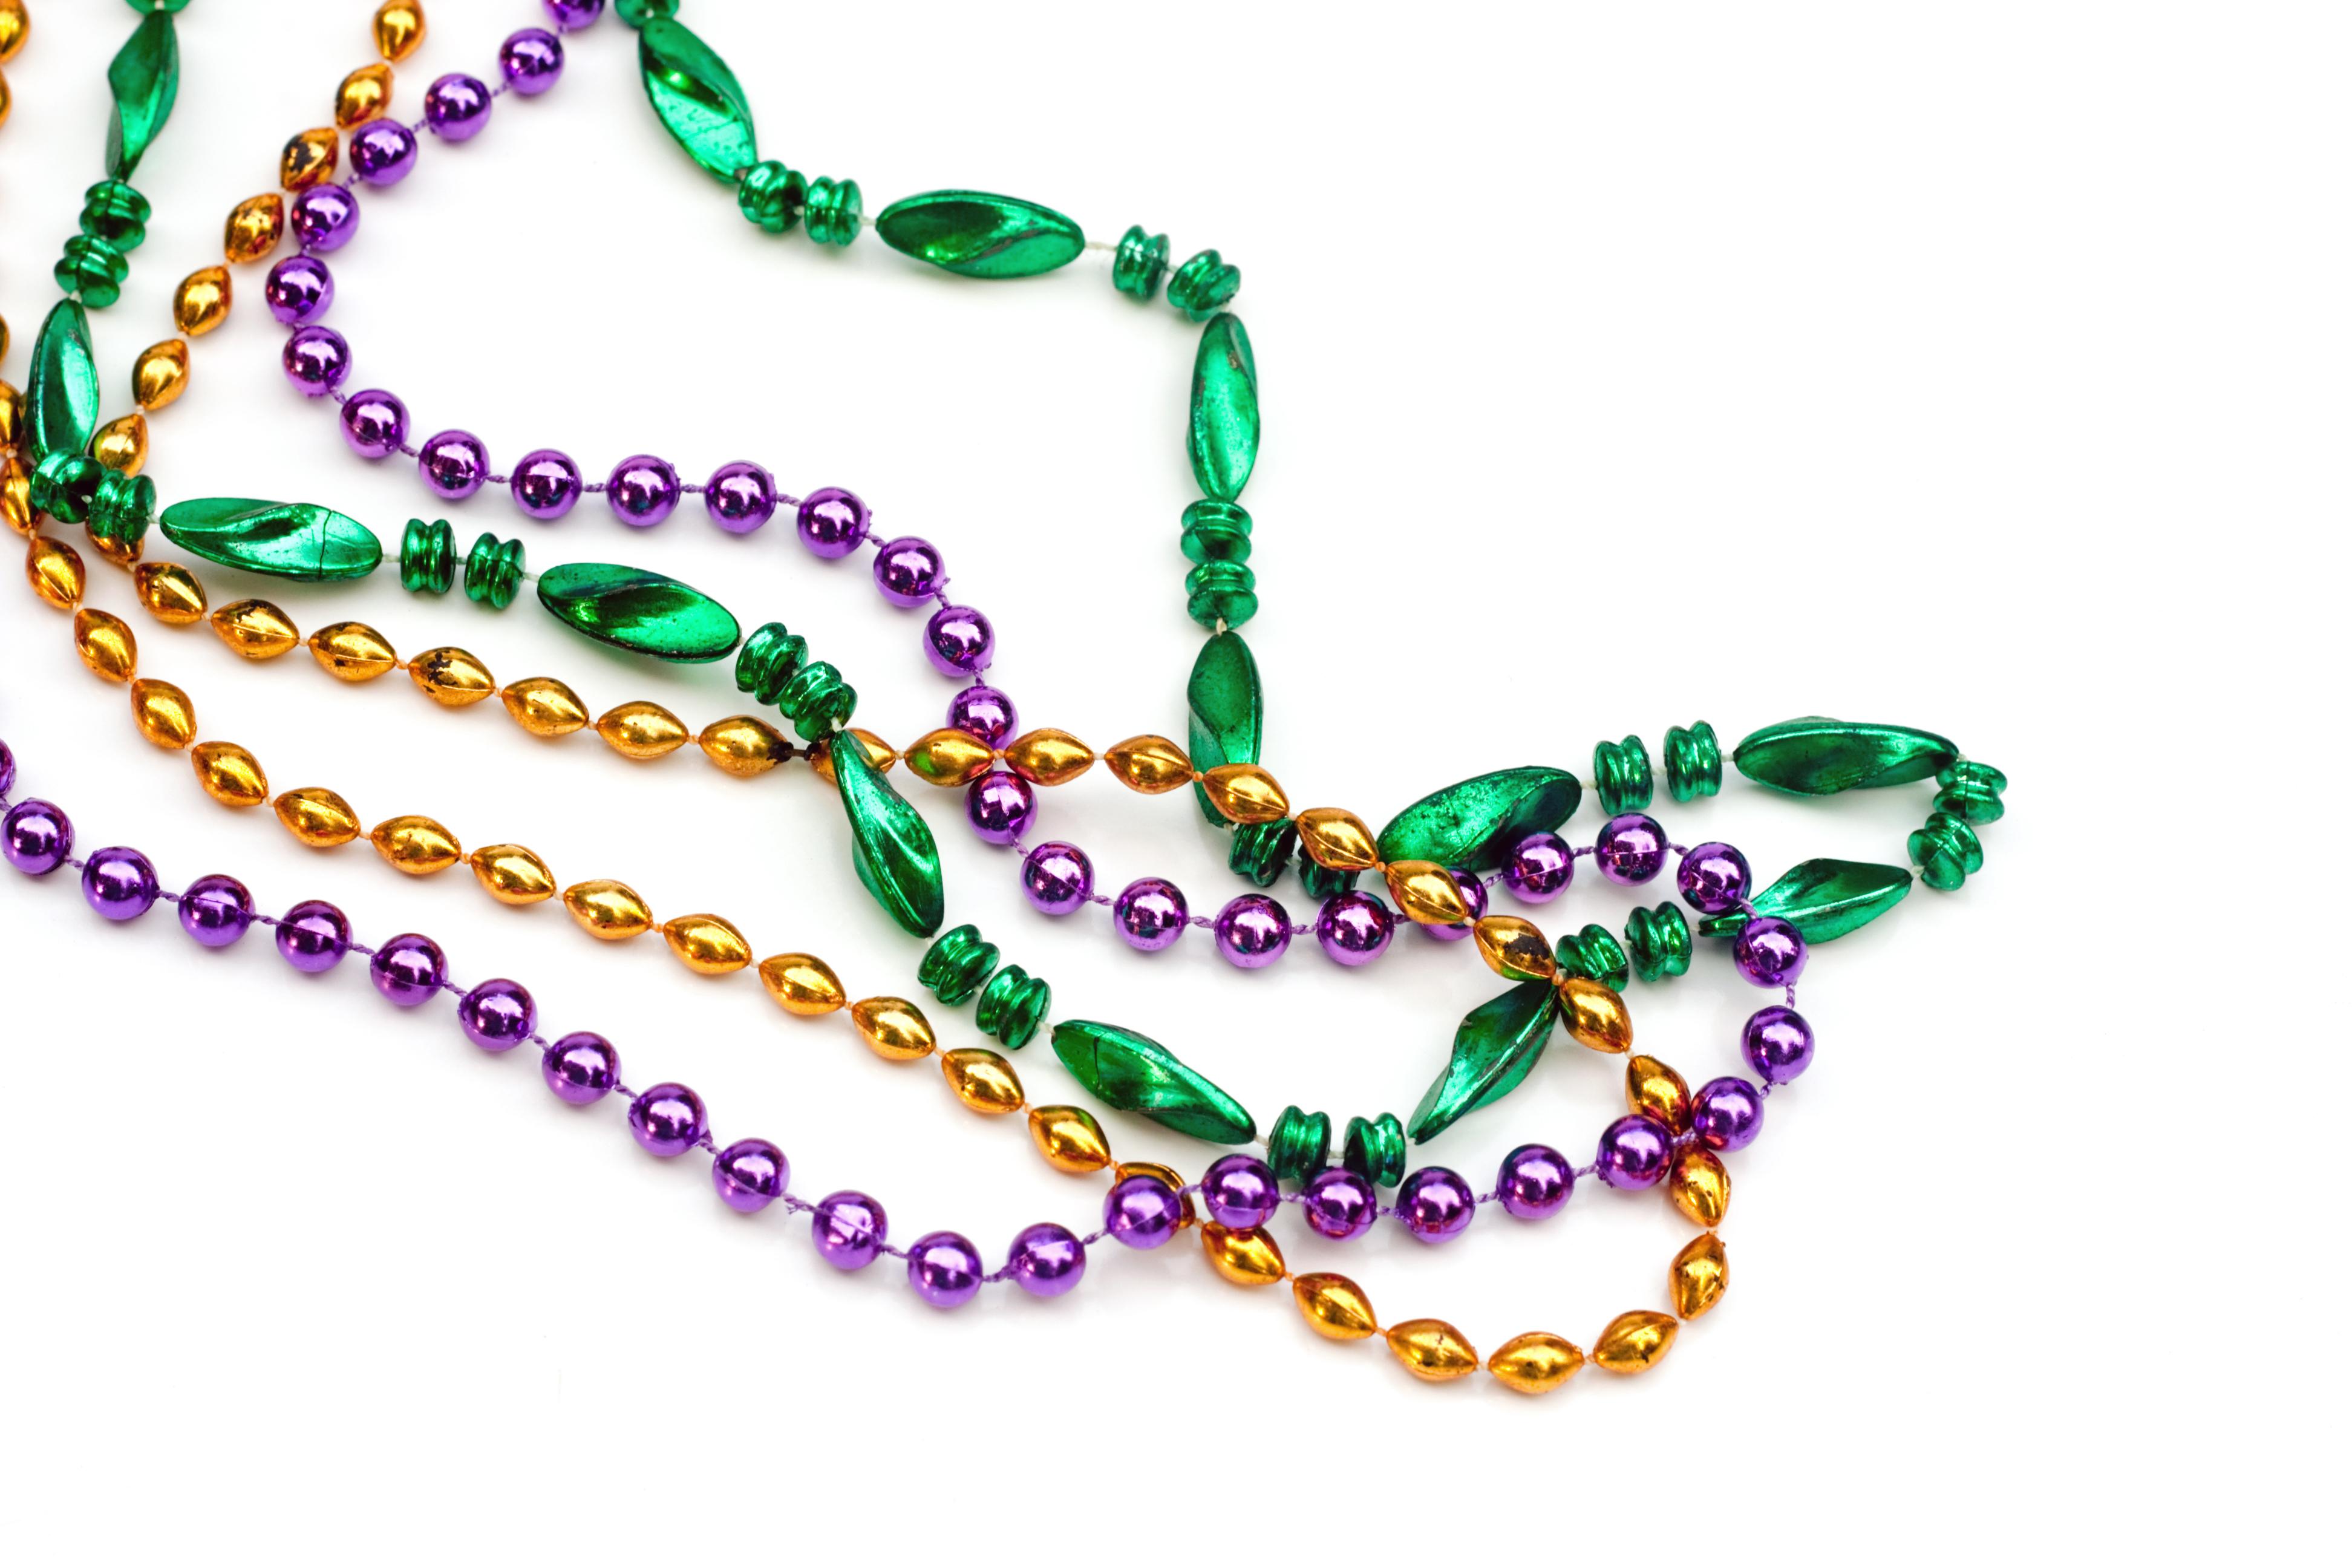 mardi gras beads purple green gold